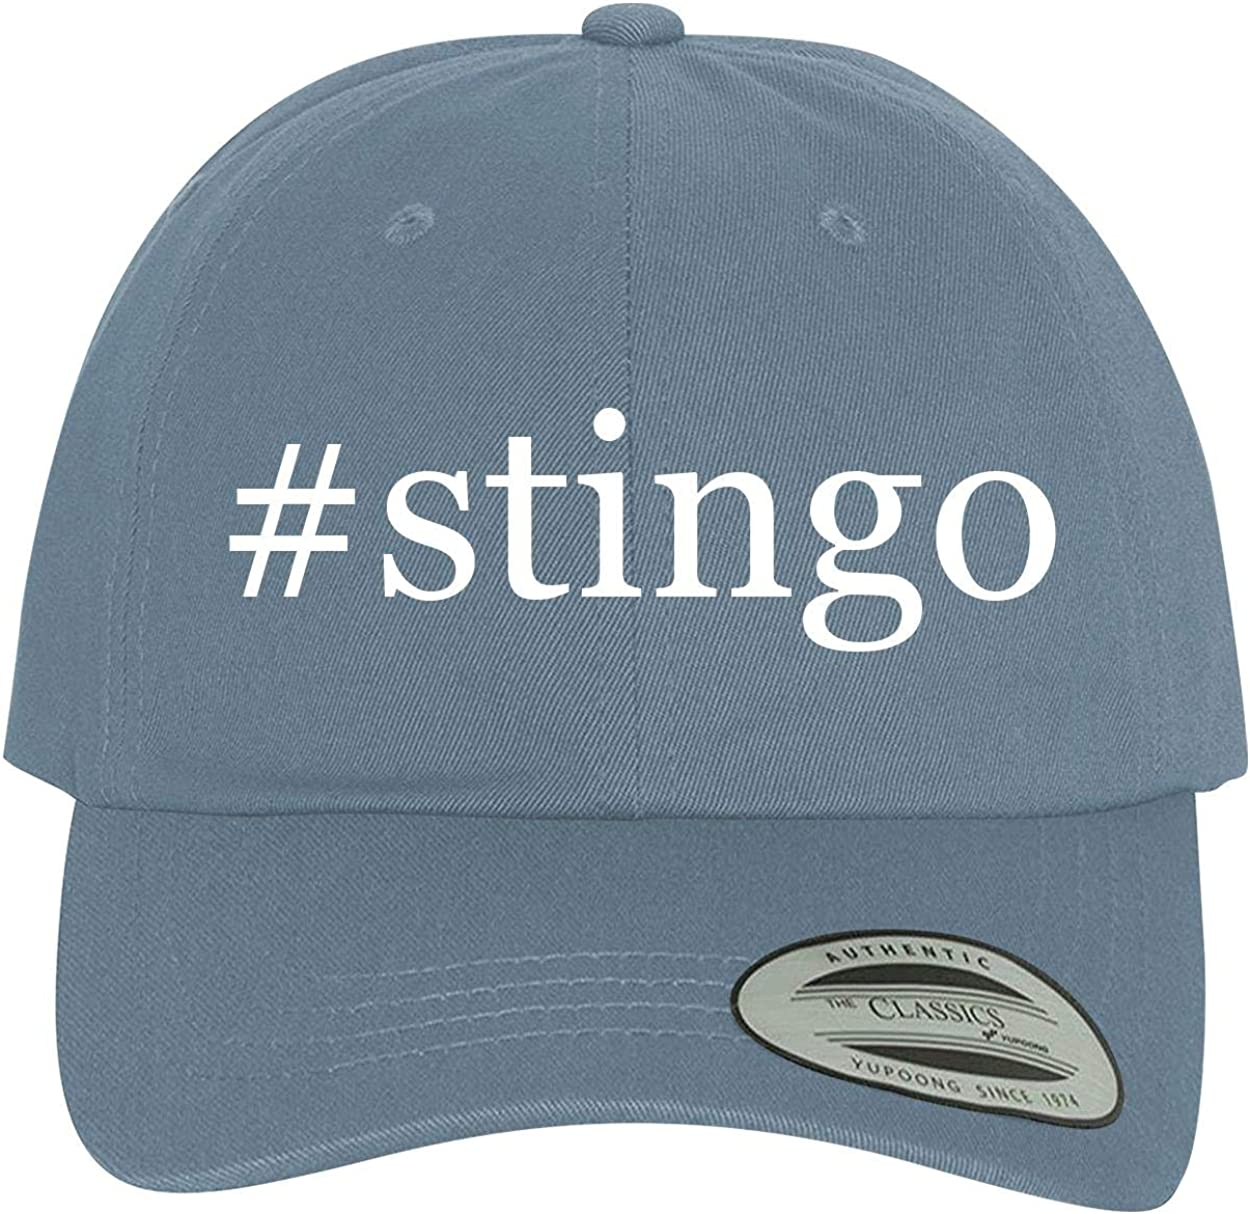 Comfortable Dad Hat Baseball Cap BH Cool Designs #Stingo